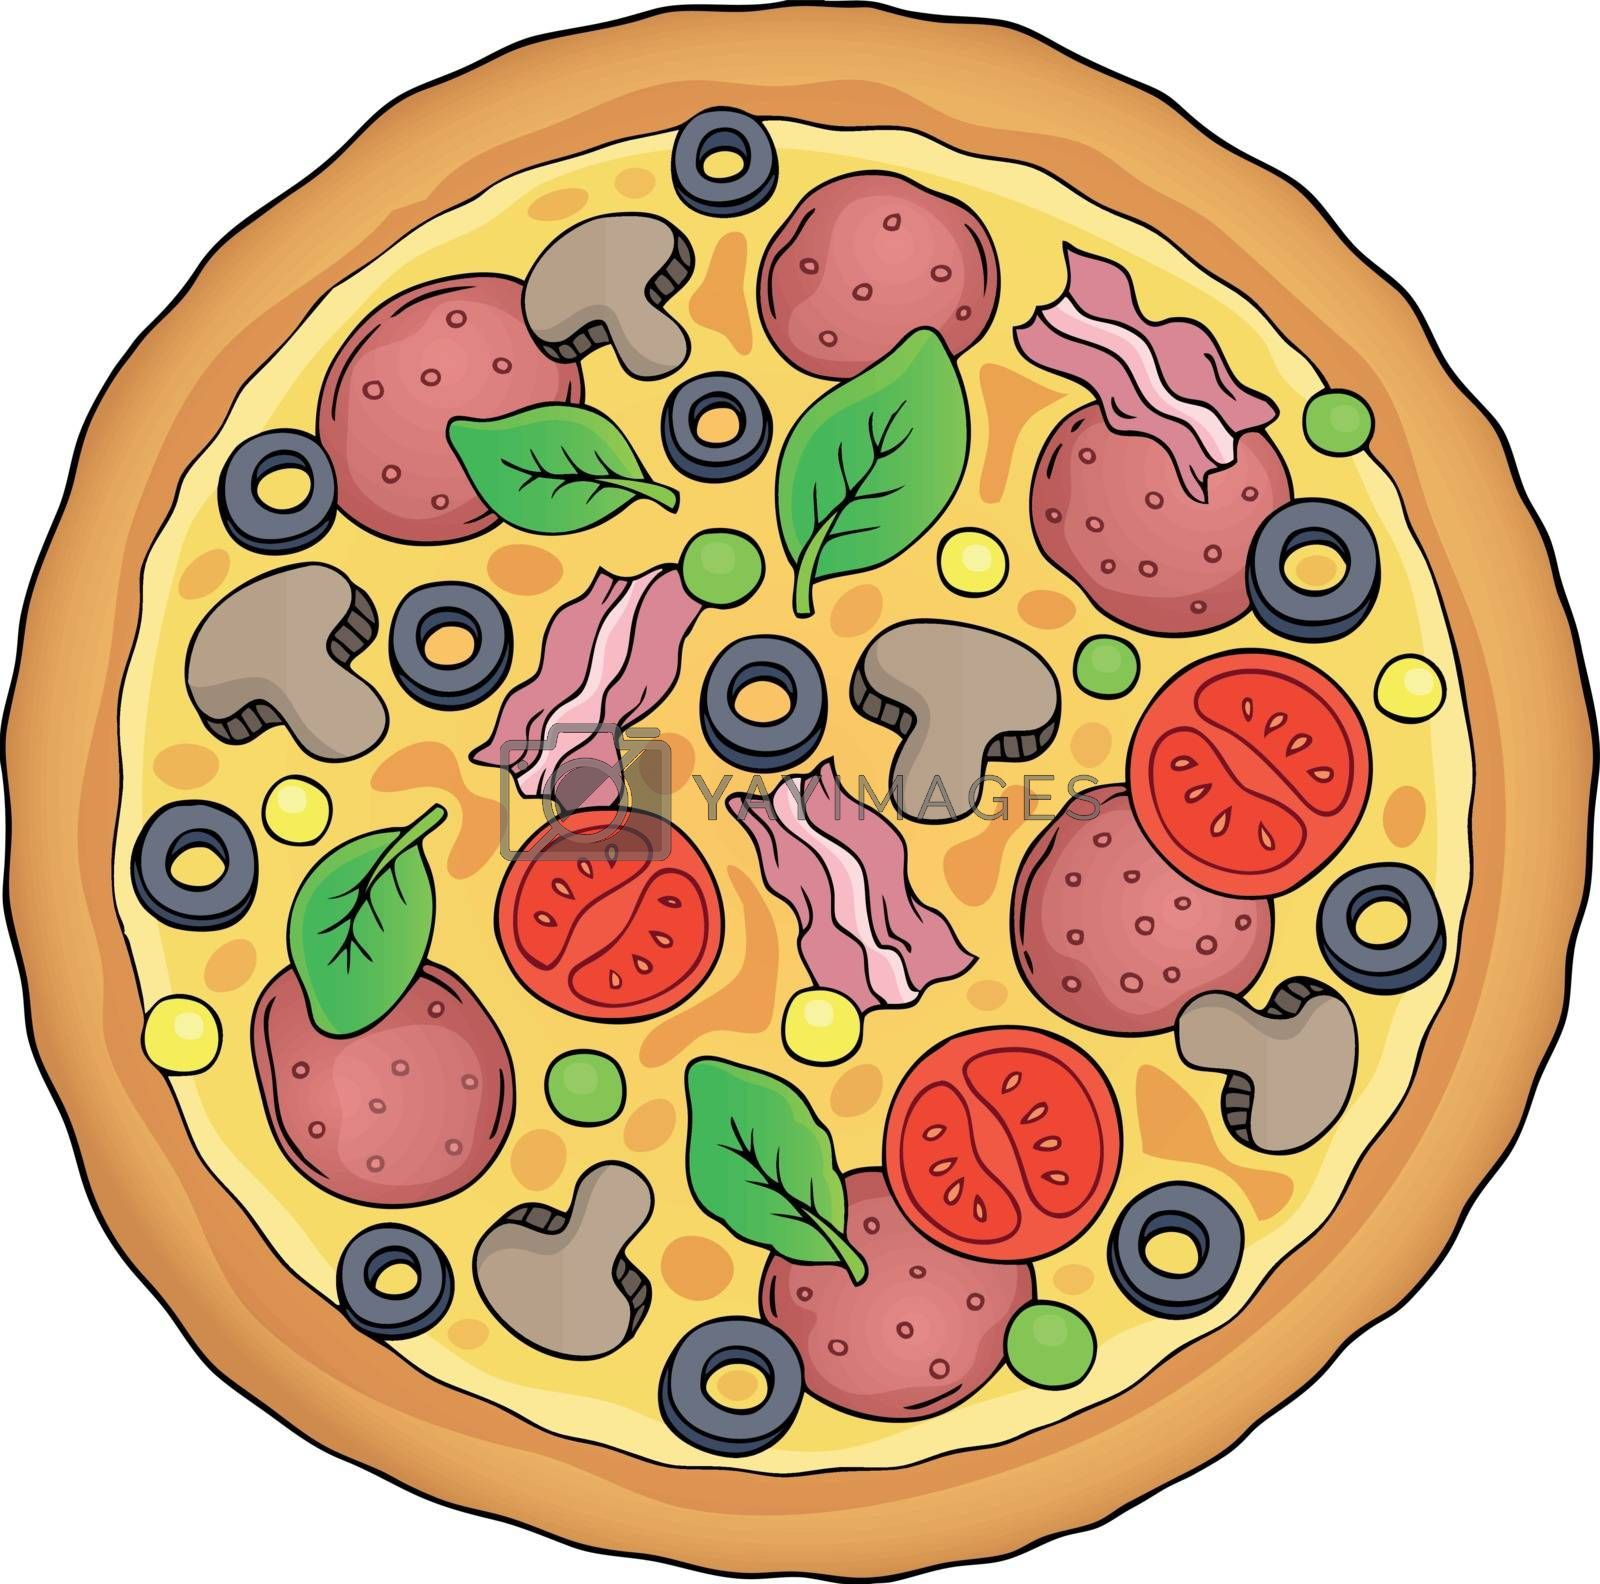 Whole pizza theme image 1 - eps10 vector illustration.